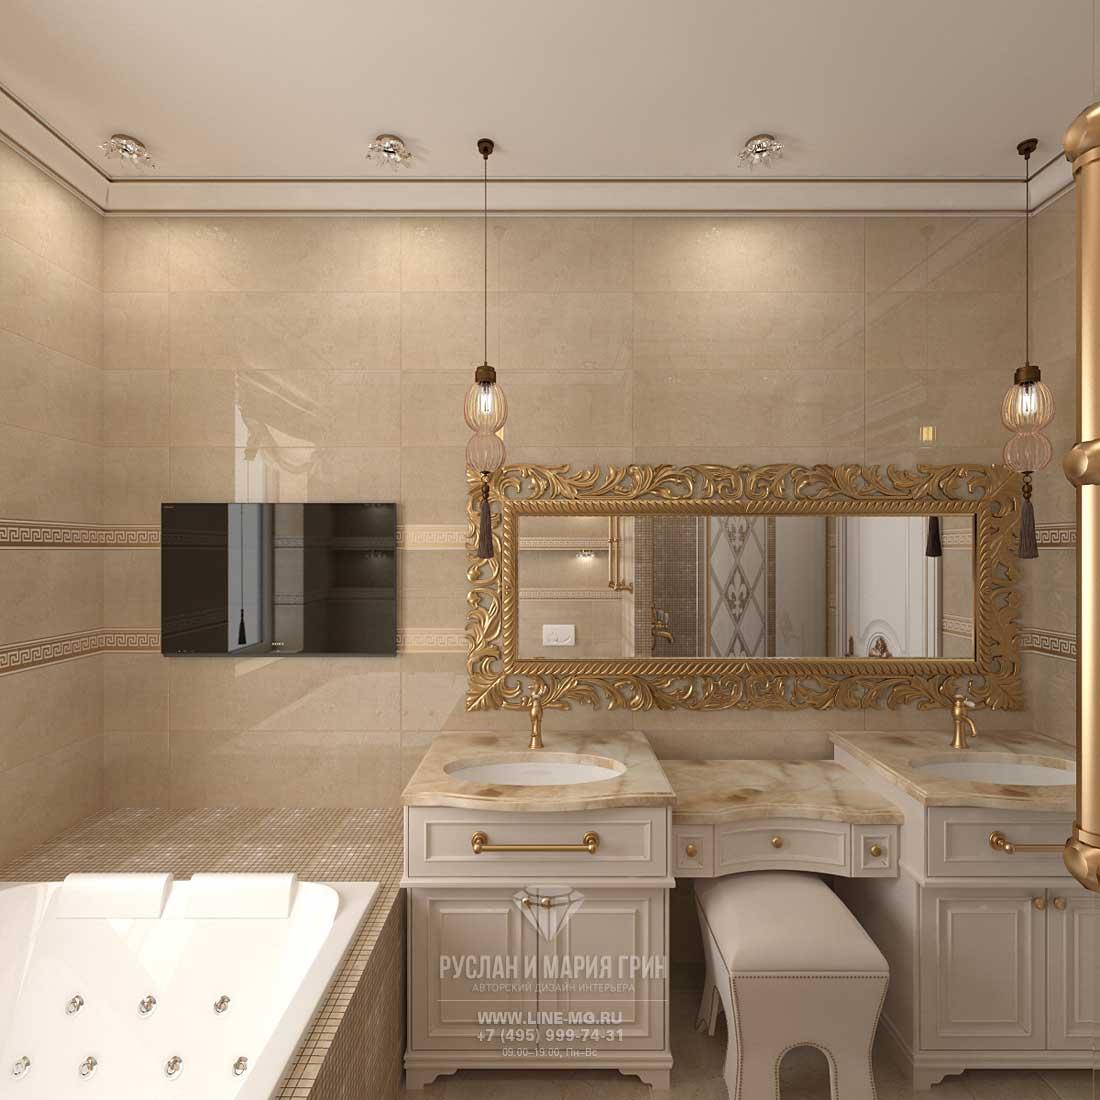 Дизайн ванной комнаты. Фото 2016